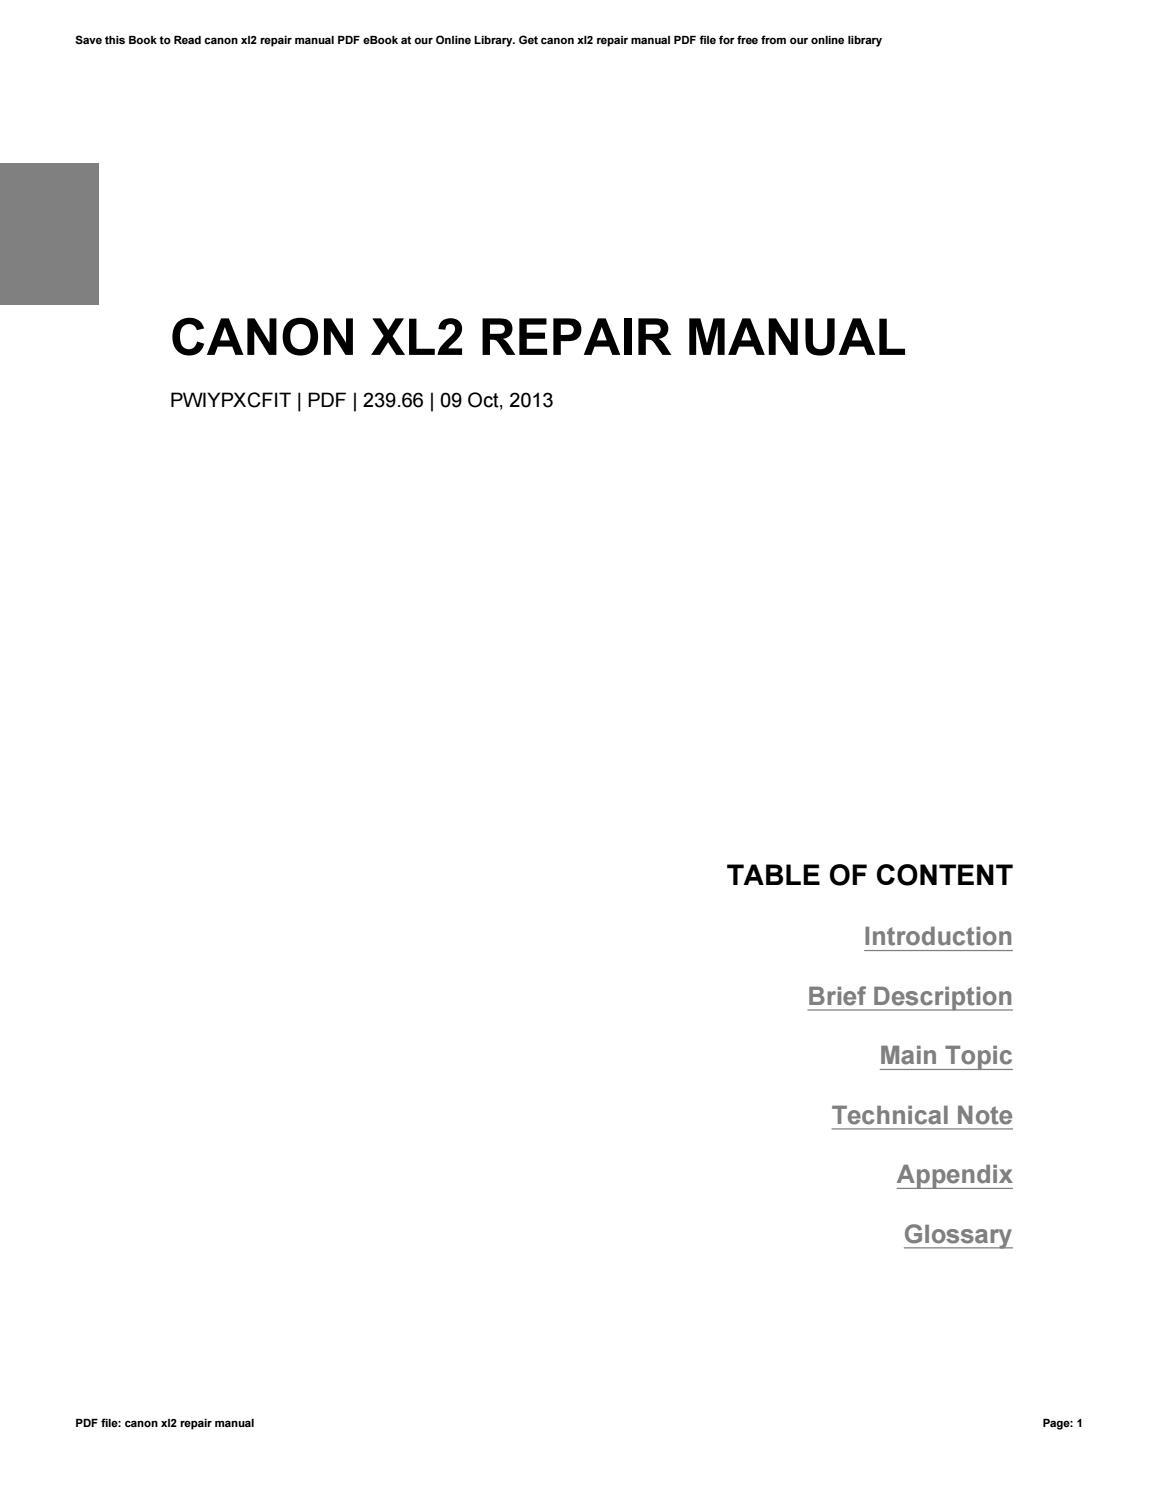 canon hr10 manual daily instruction manual guides u2022 rh testingwordpress co